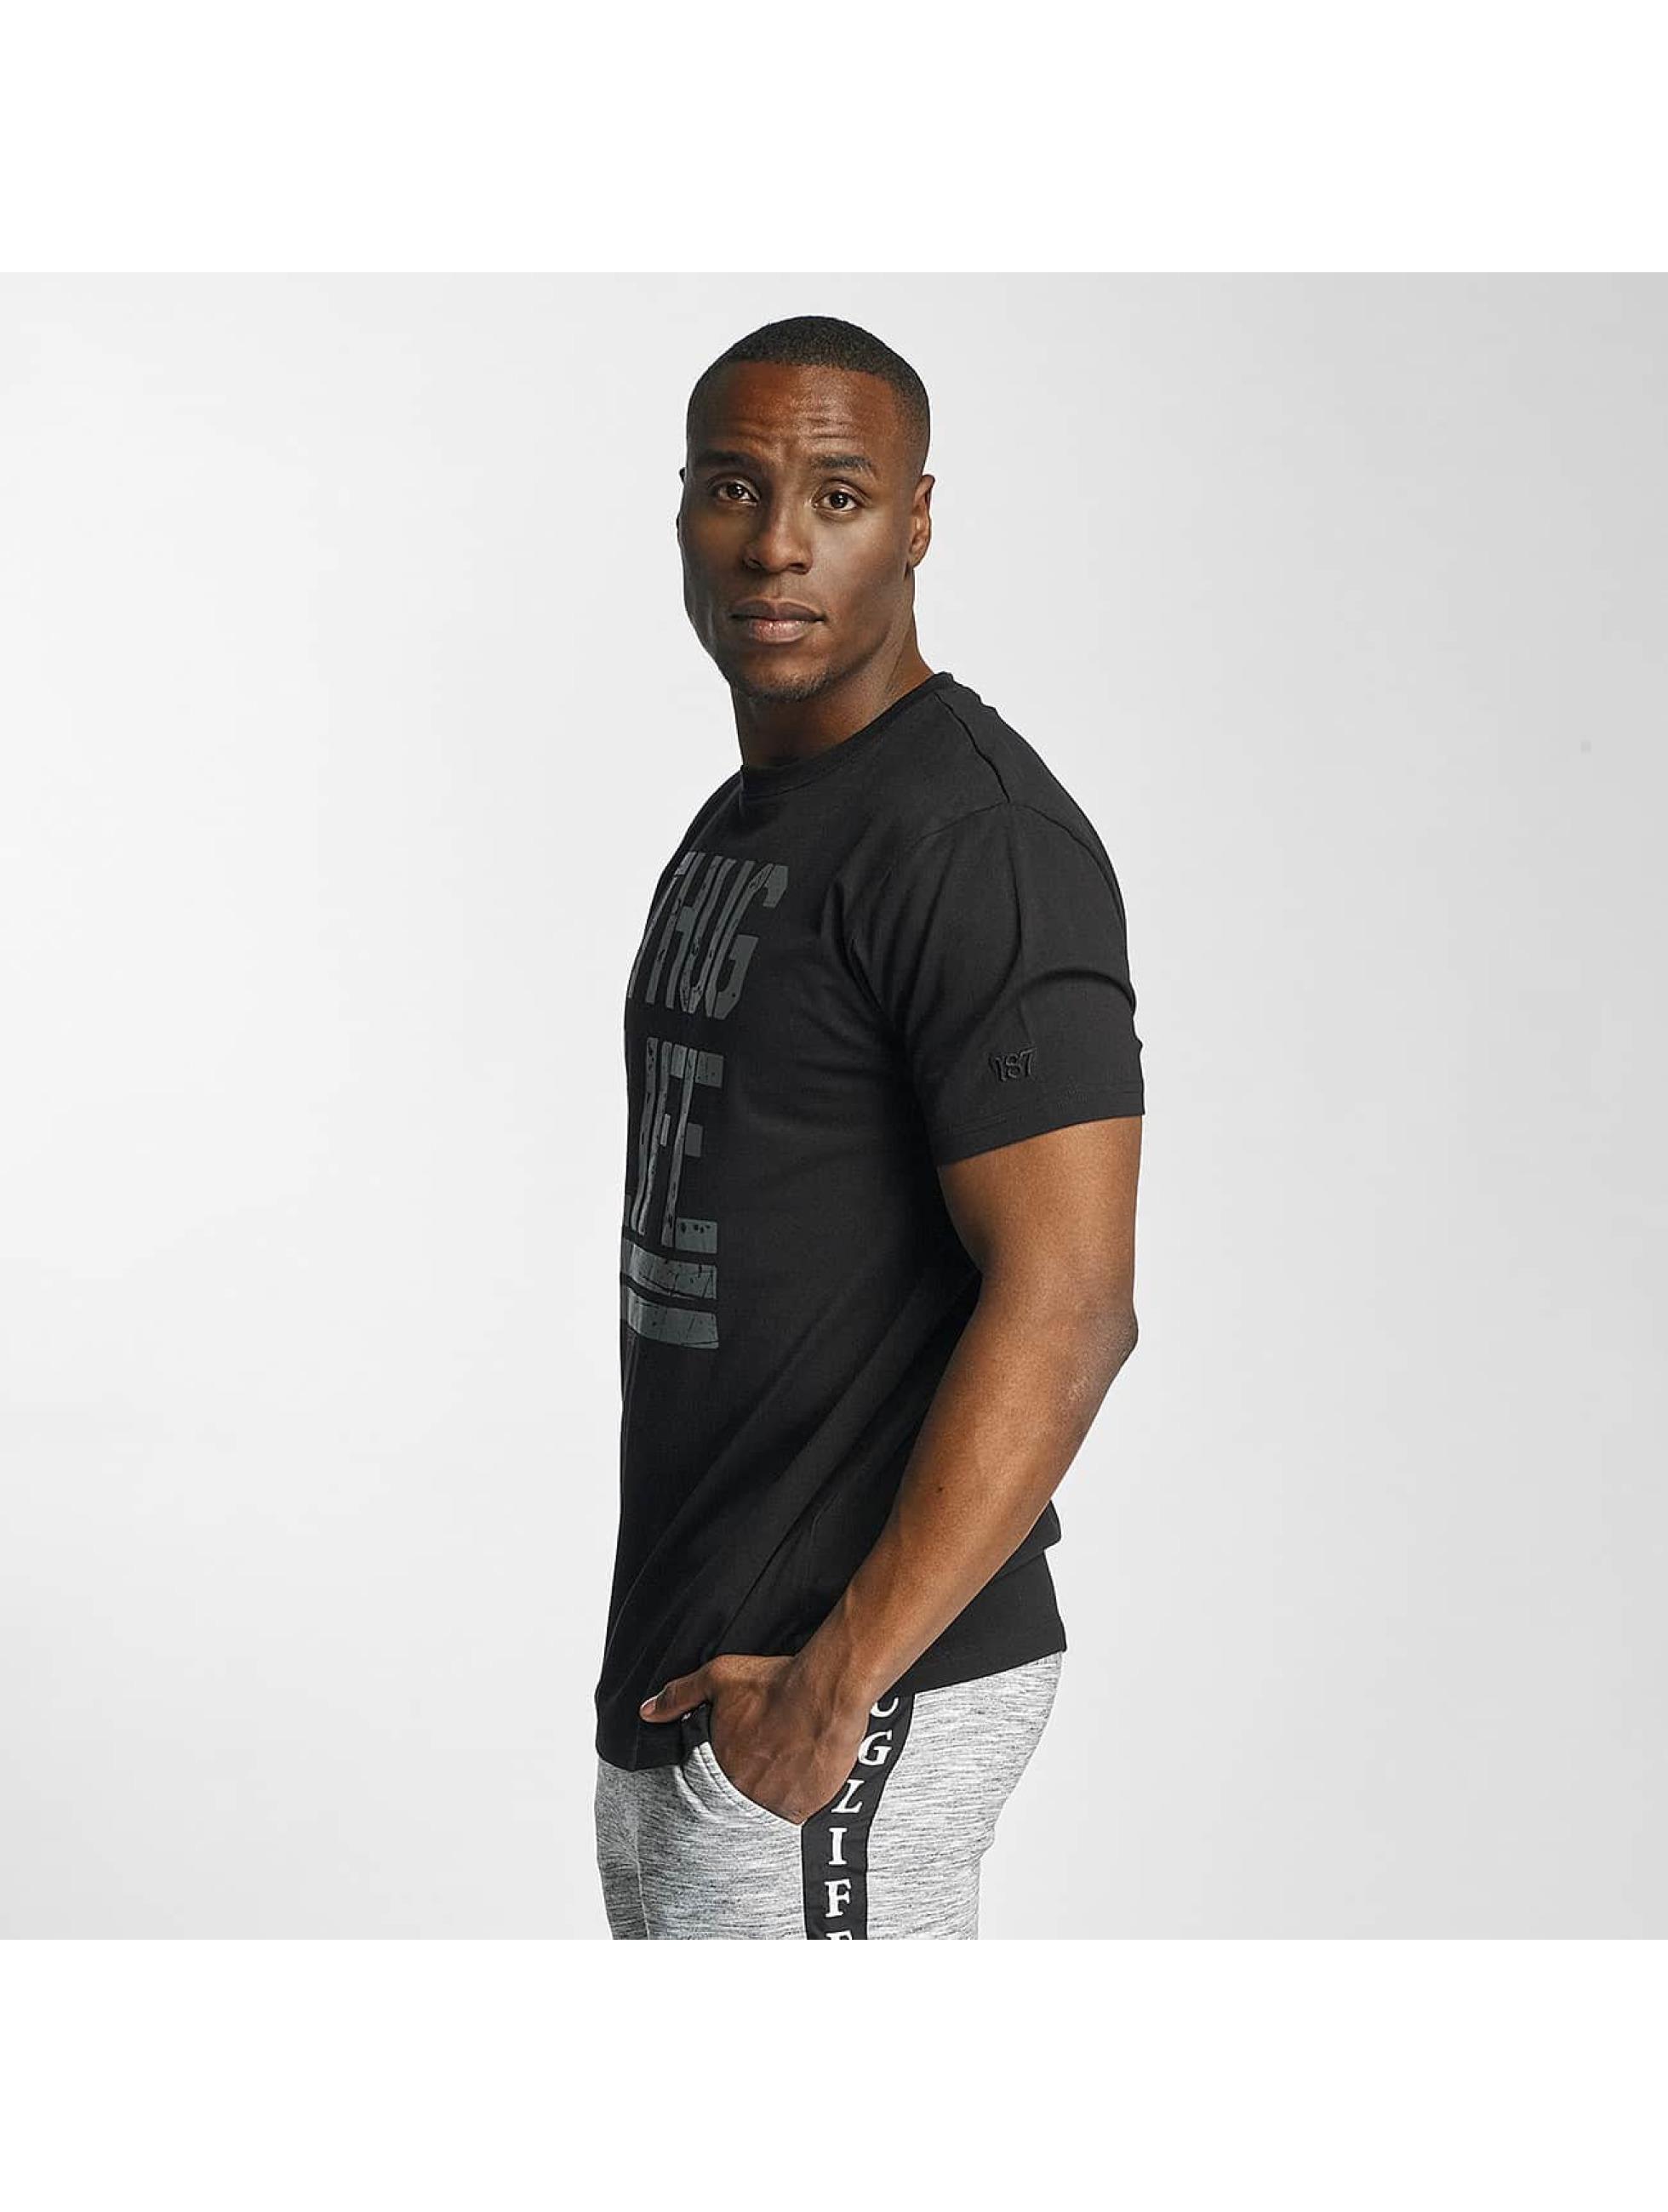 Thug Life / T-Shirt Ghost in black M